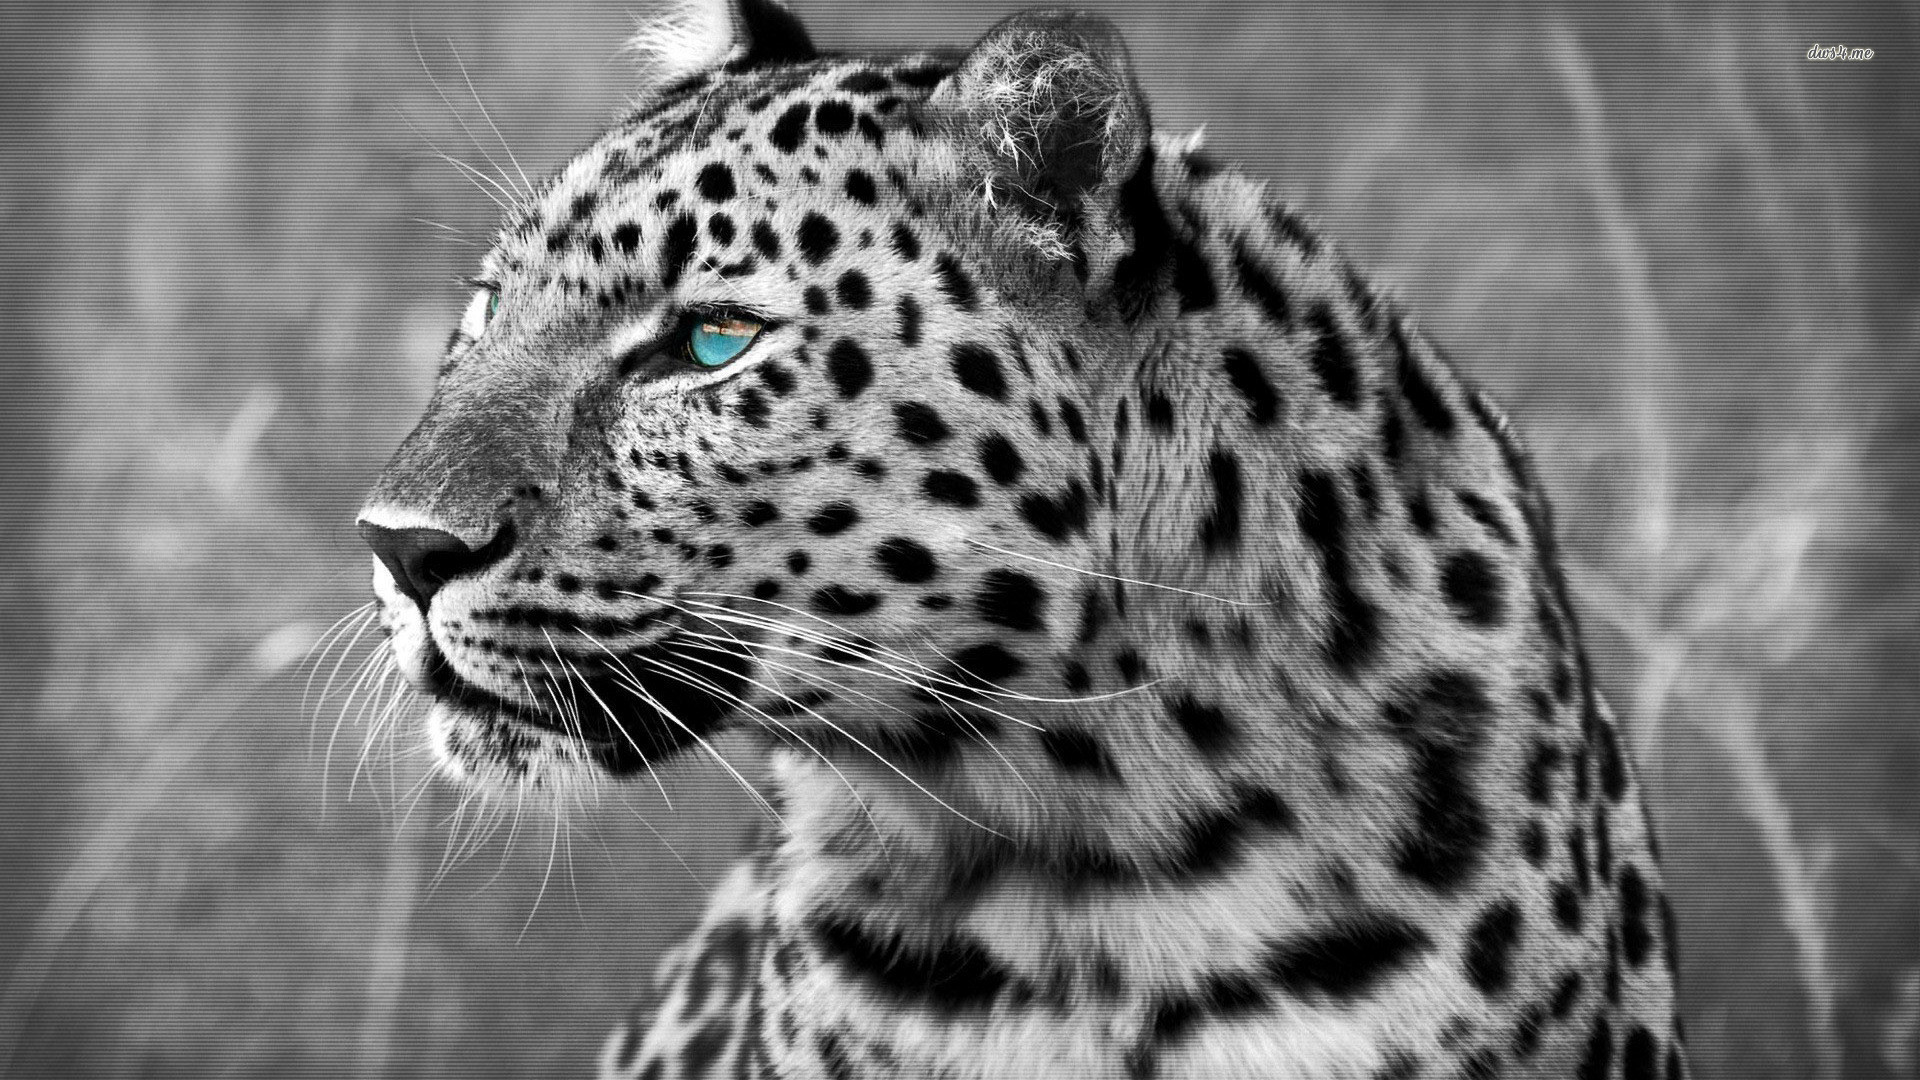 Digital Leopard Art Wallpapers: Snow Leopard Wallpaper (72+ Images